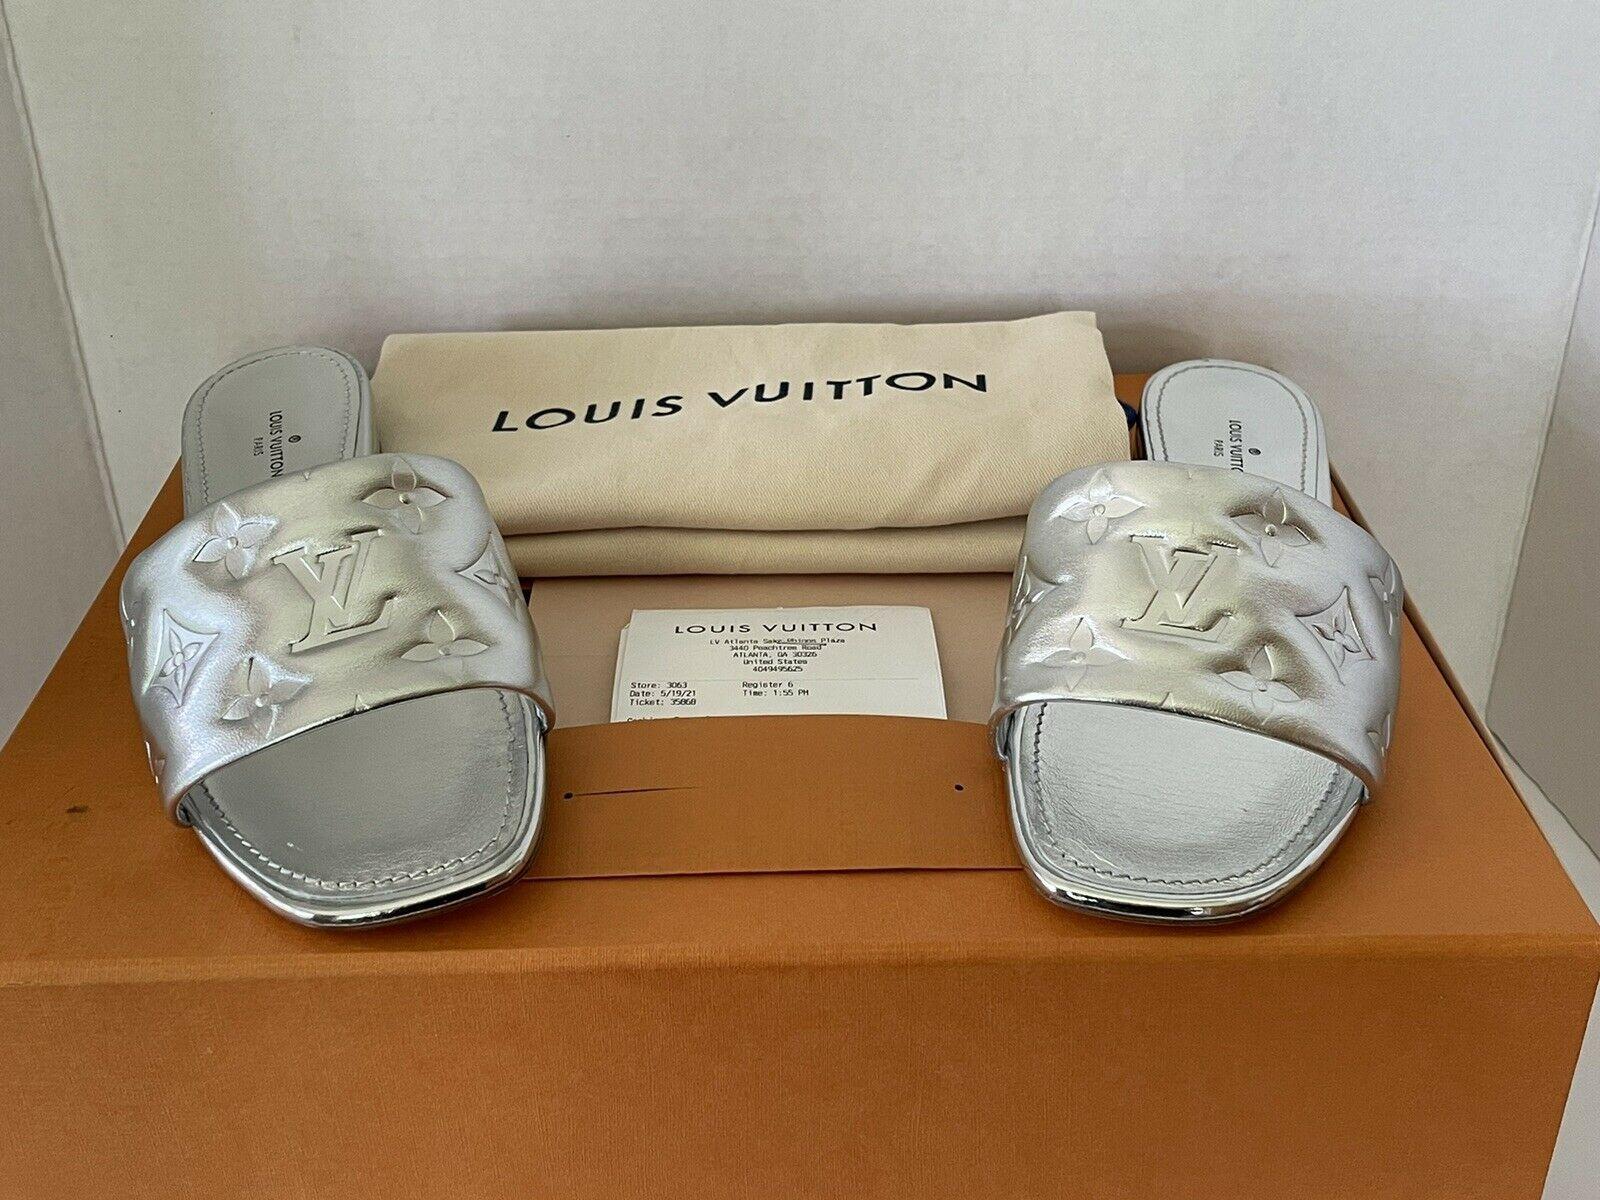 Louis Vuitton Shoes Revival Flat Mule Silver Lambskin Leather Size 36.5 6.5 - $1,107.85